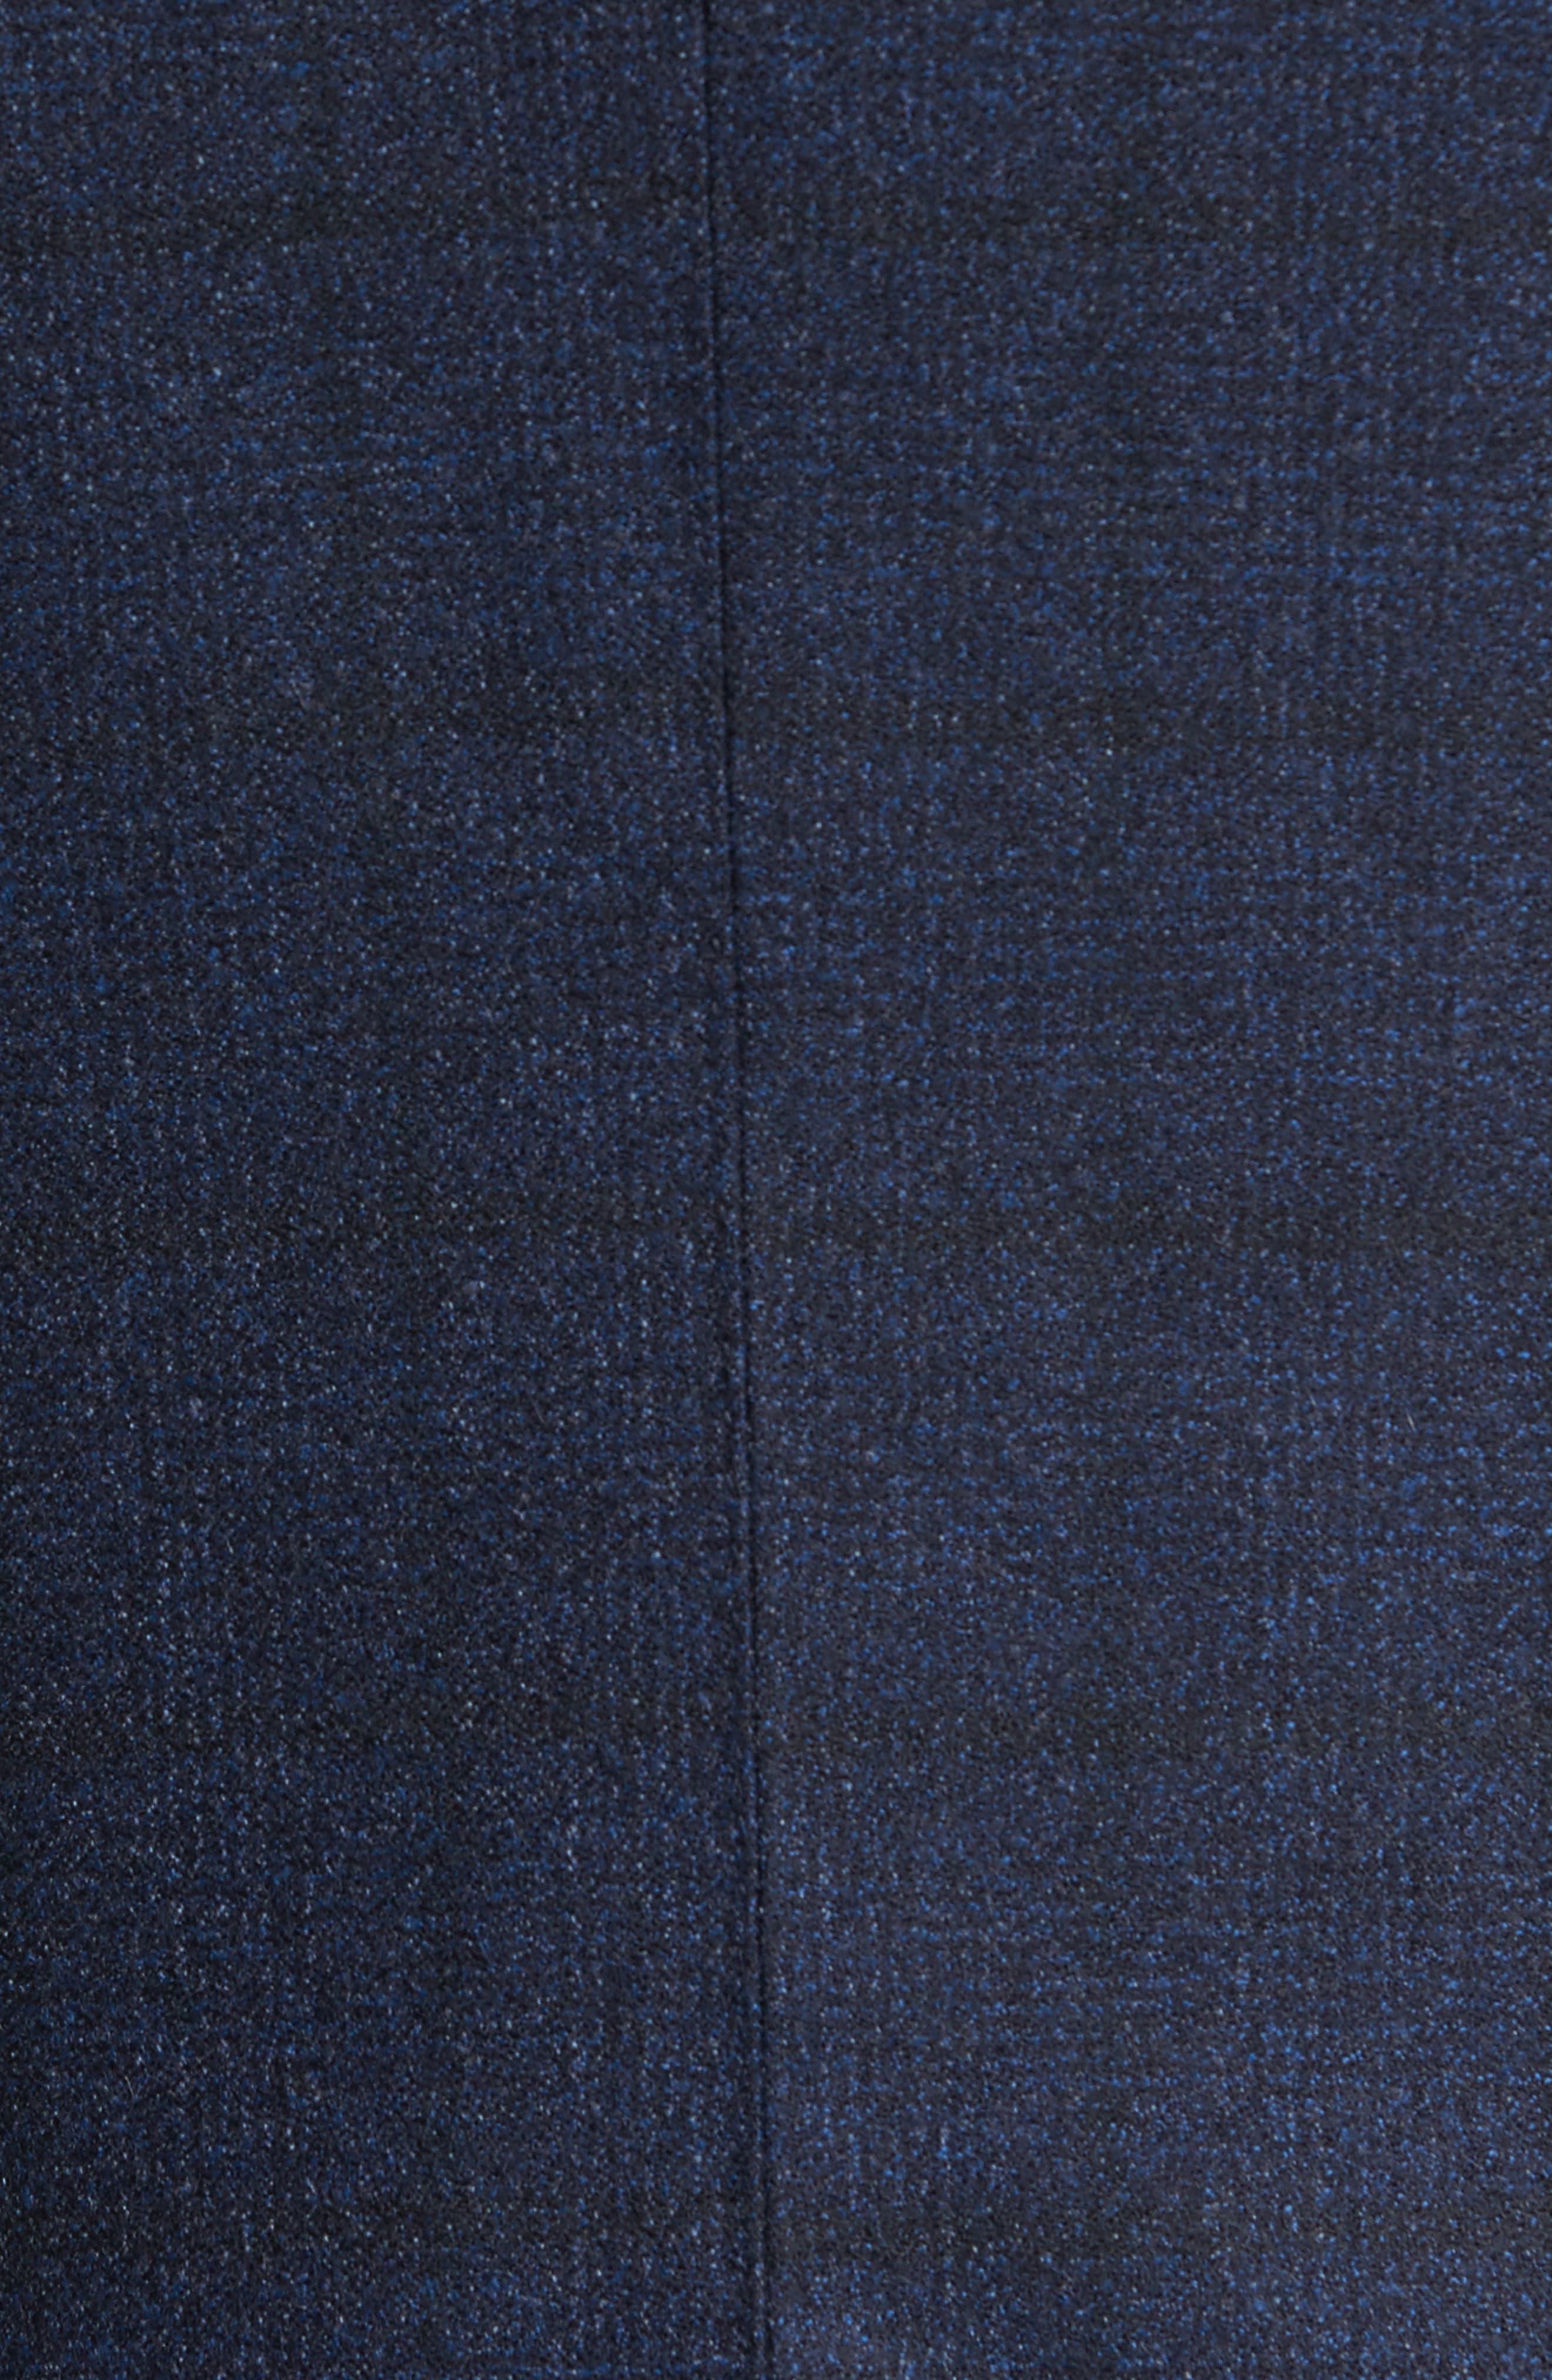 Andersen Trim Fit Plaid Wool Sport Coat,                             Alternate thumbnail 6, color,                             209